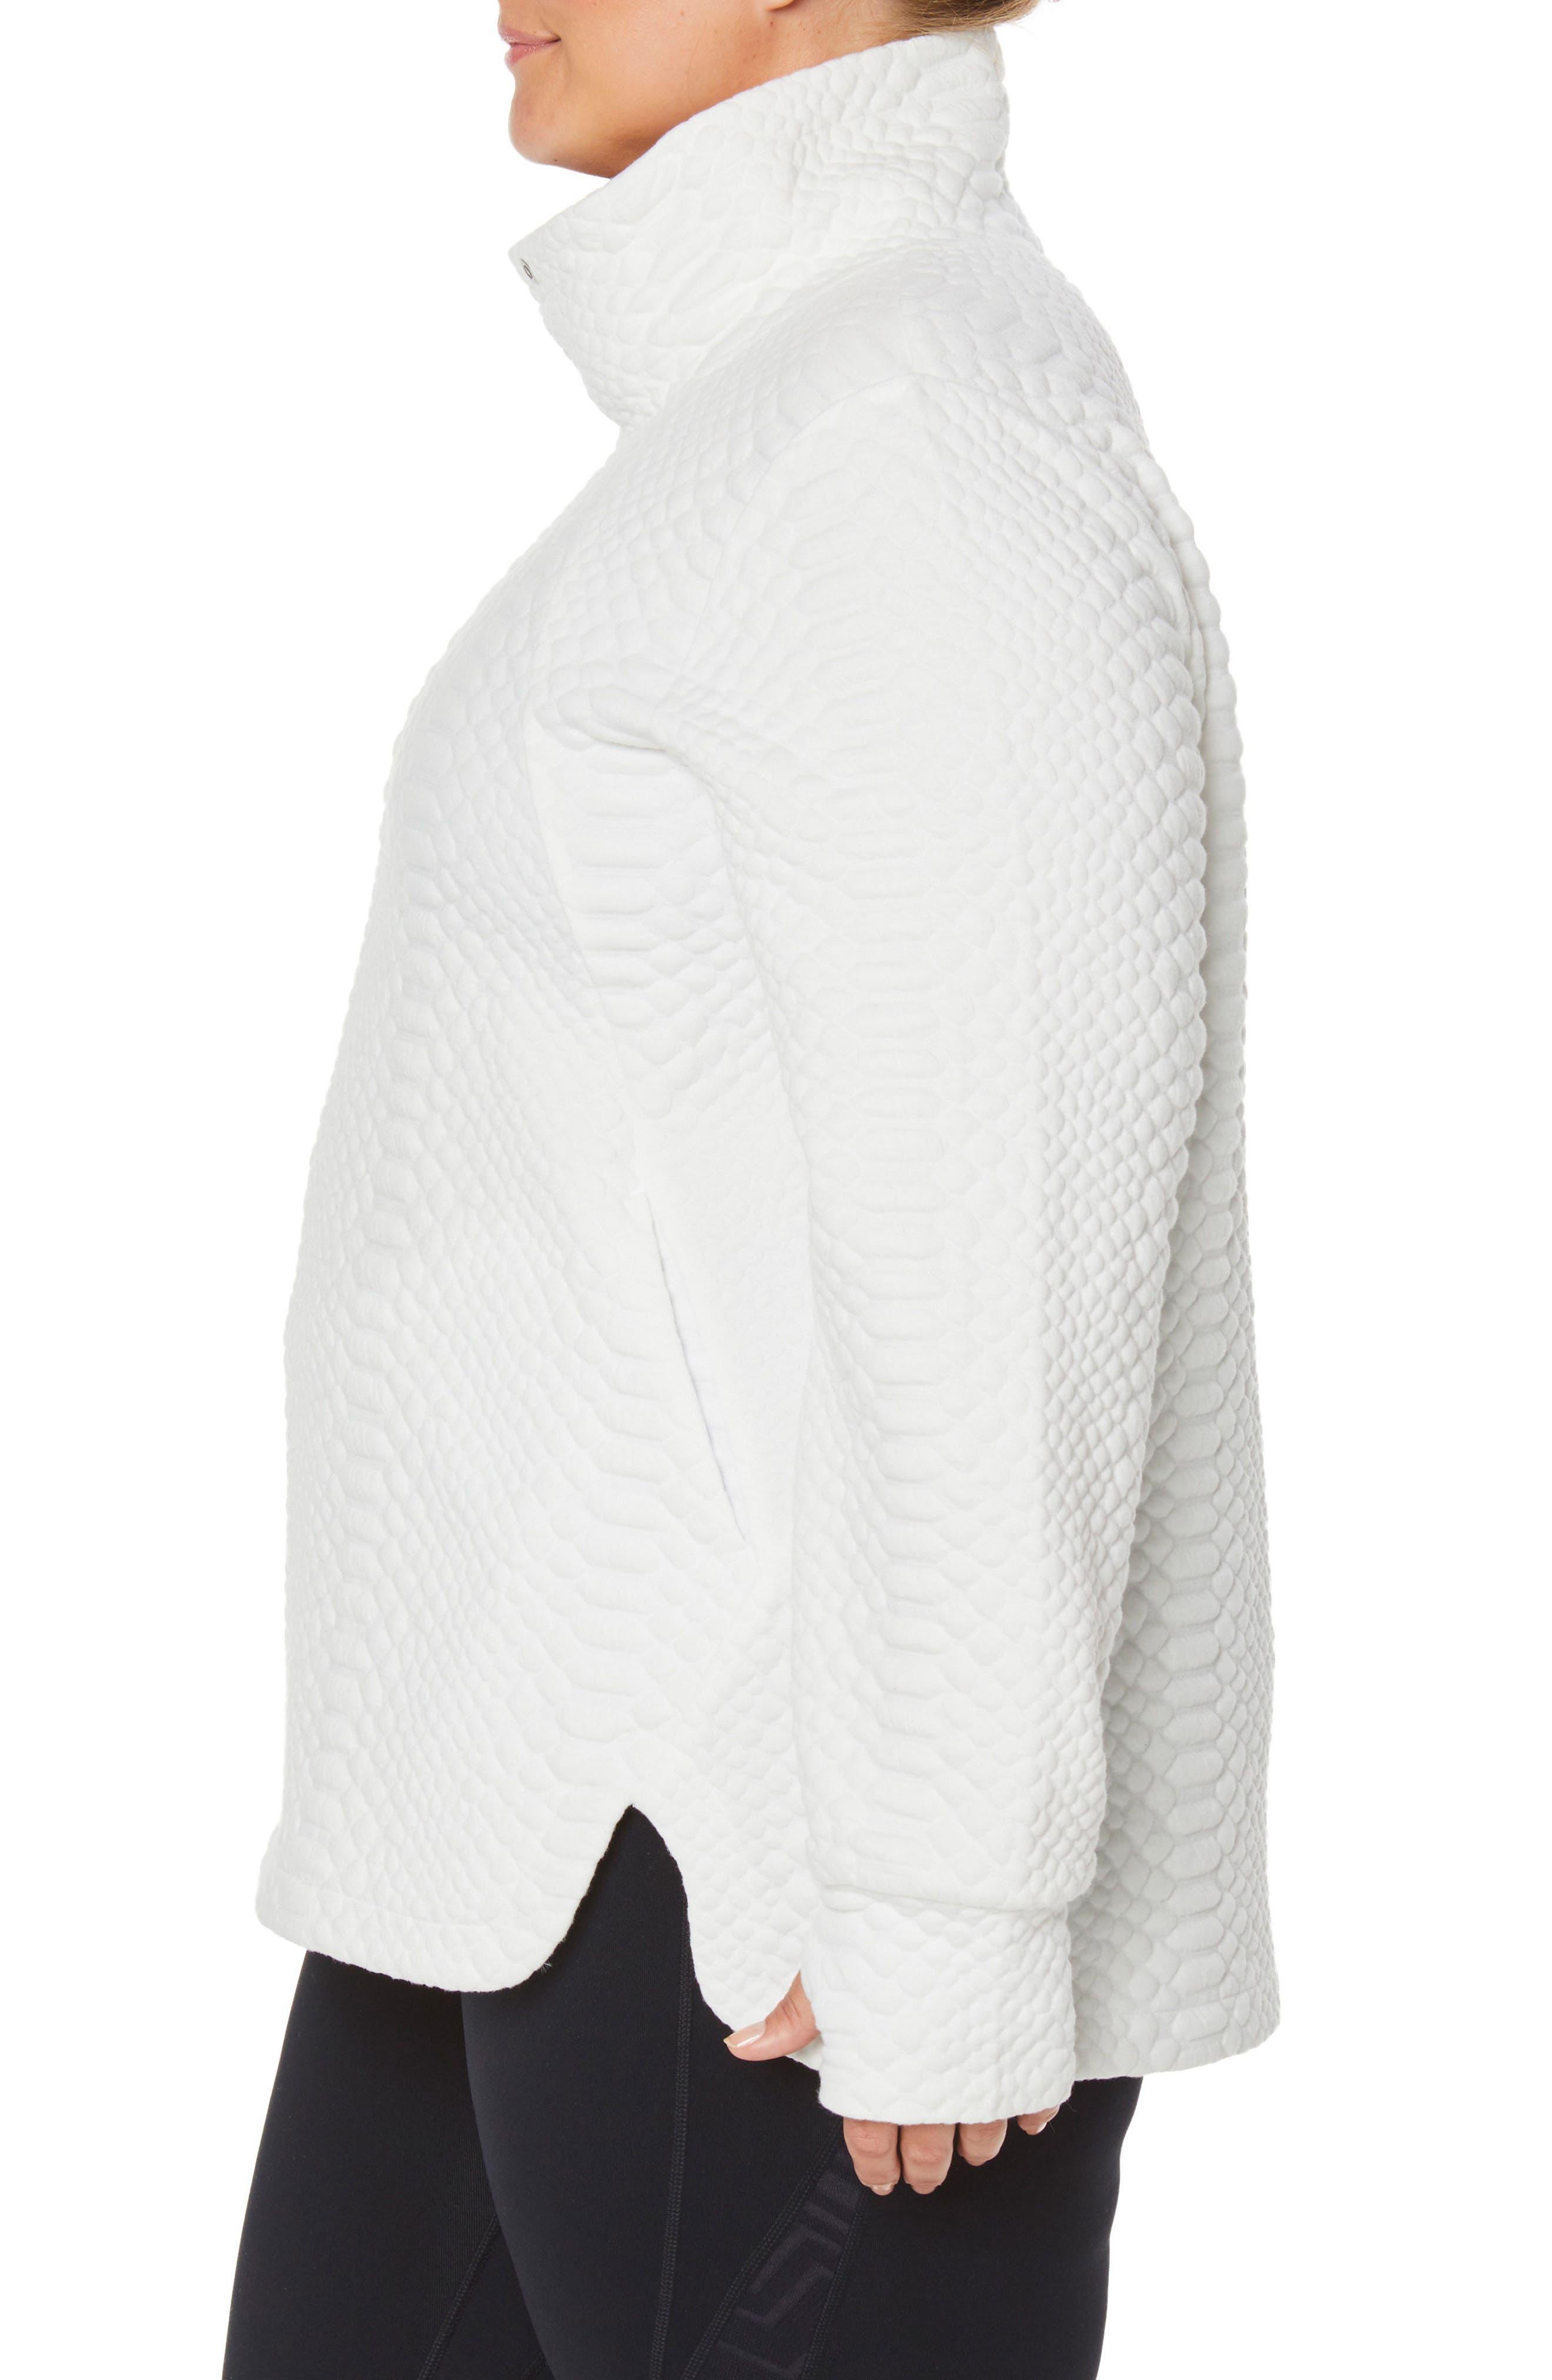 Saturday Mock Neck Pullover,                             Alternate thumbnail 3, color,                             WINTER WHITE